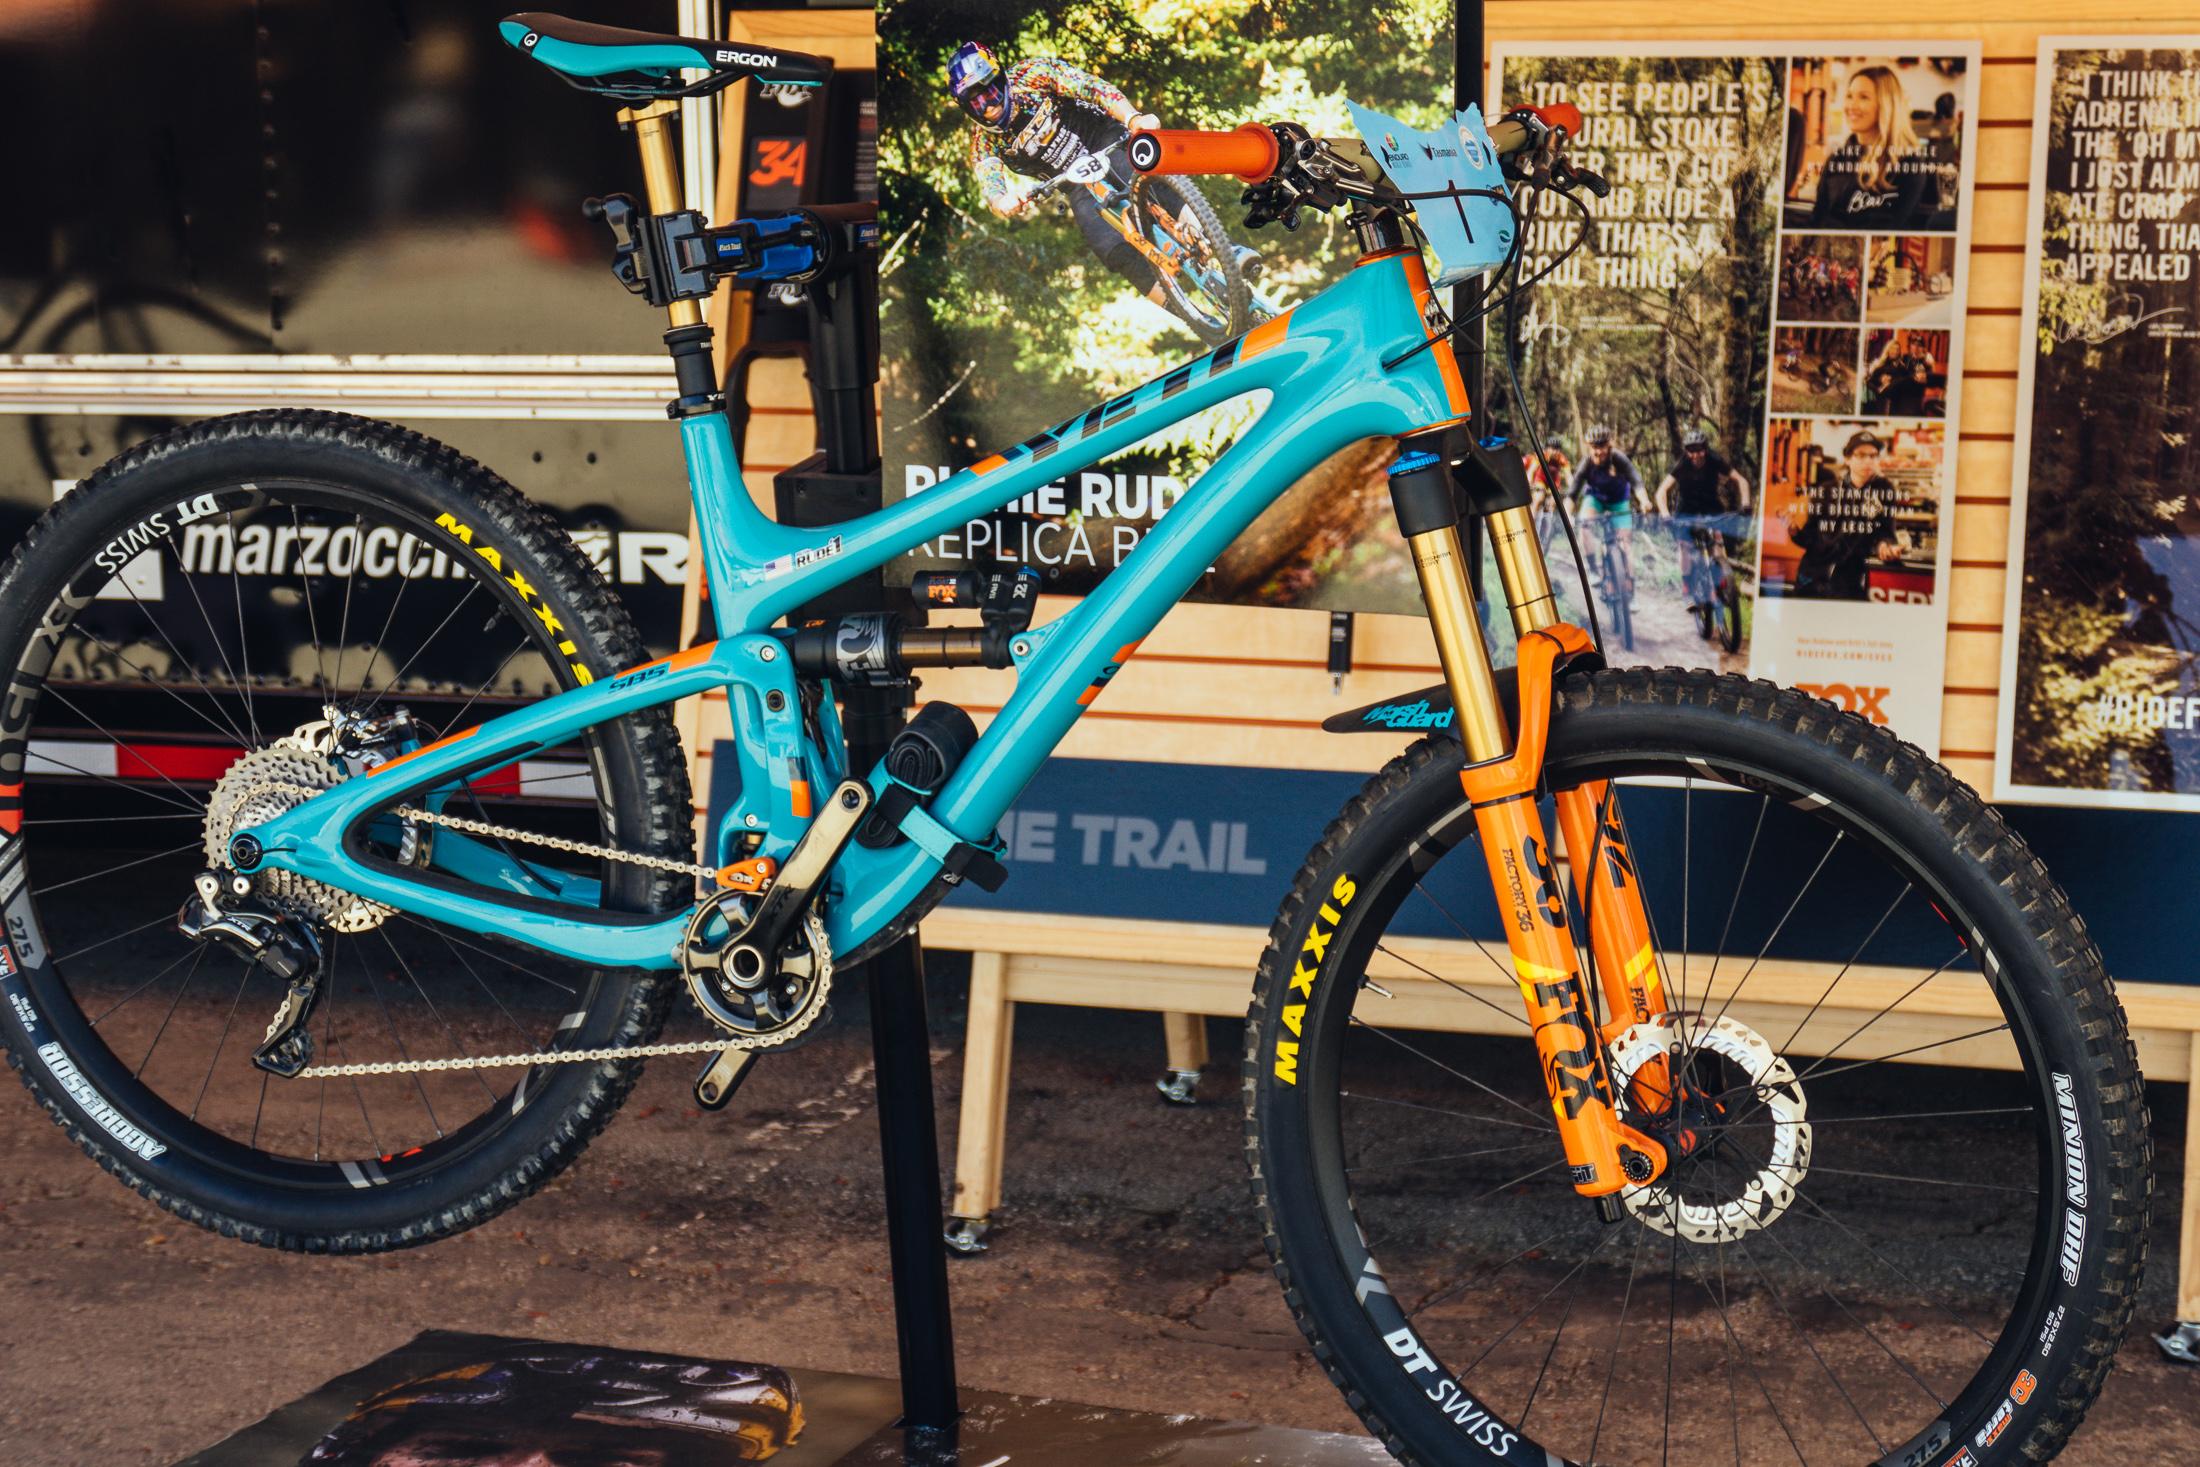 Replica Richie Rude Yeti Sb5 Ews Race Bike